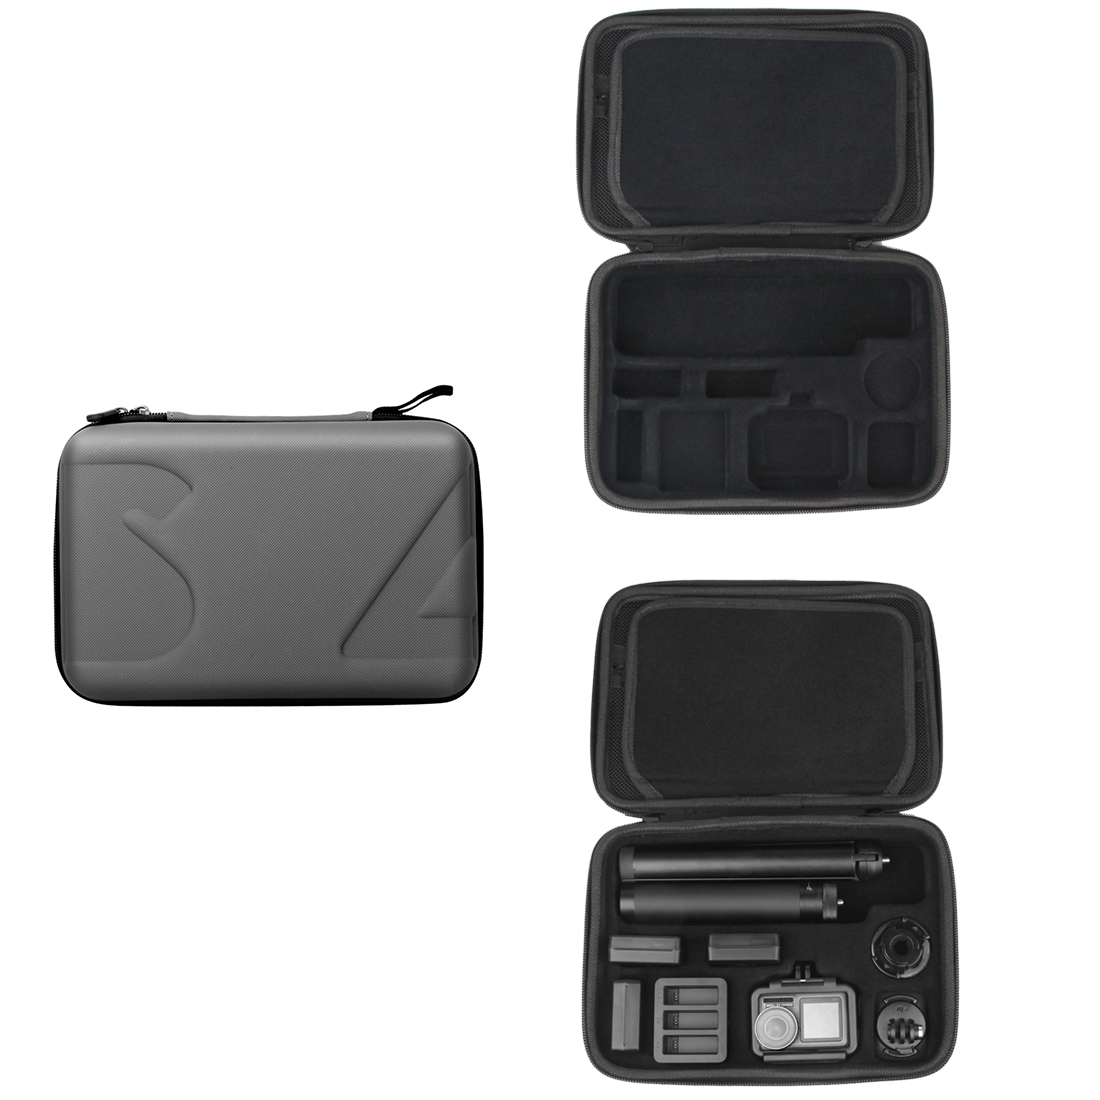 SUNNYLIFE водонепроницаемый чехол для переноски Твердая Сумка для DJI OSMO экшн камеры 4 батареи штатив Дрон сумка аксессуары